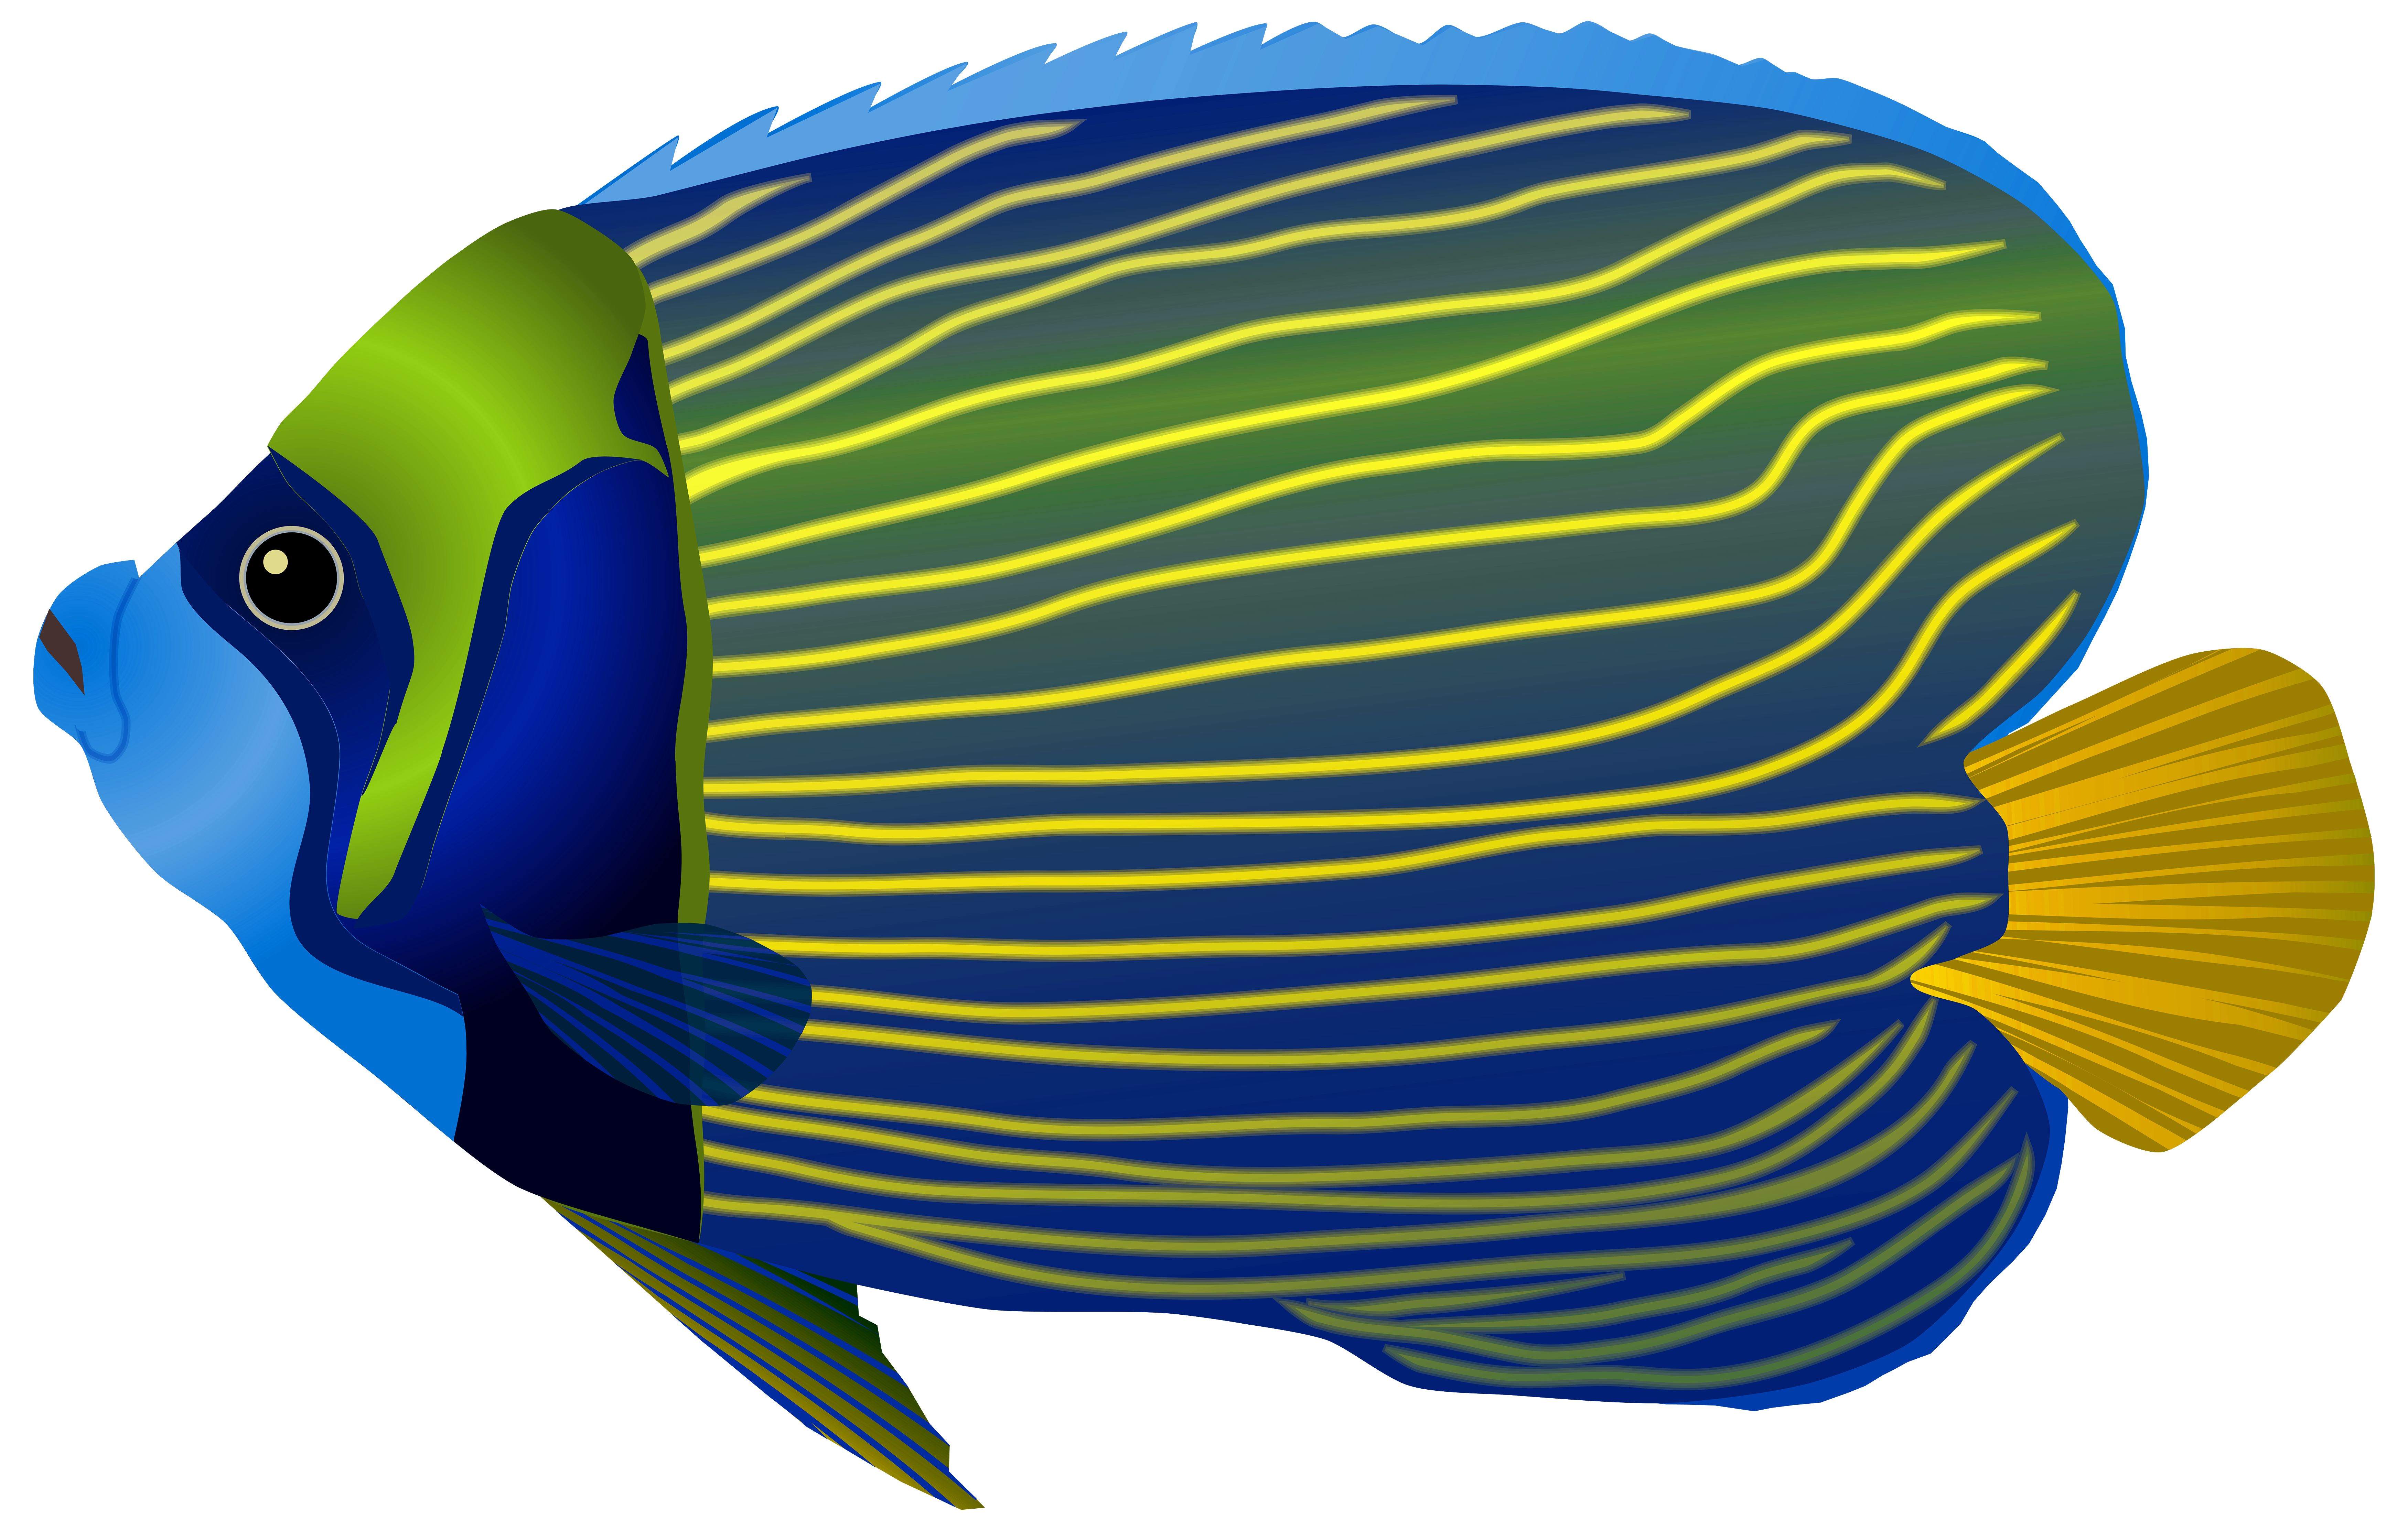 7000x4452 Blue Fish Png Clip Art Imageu200b Gallery Yopriceville